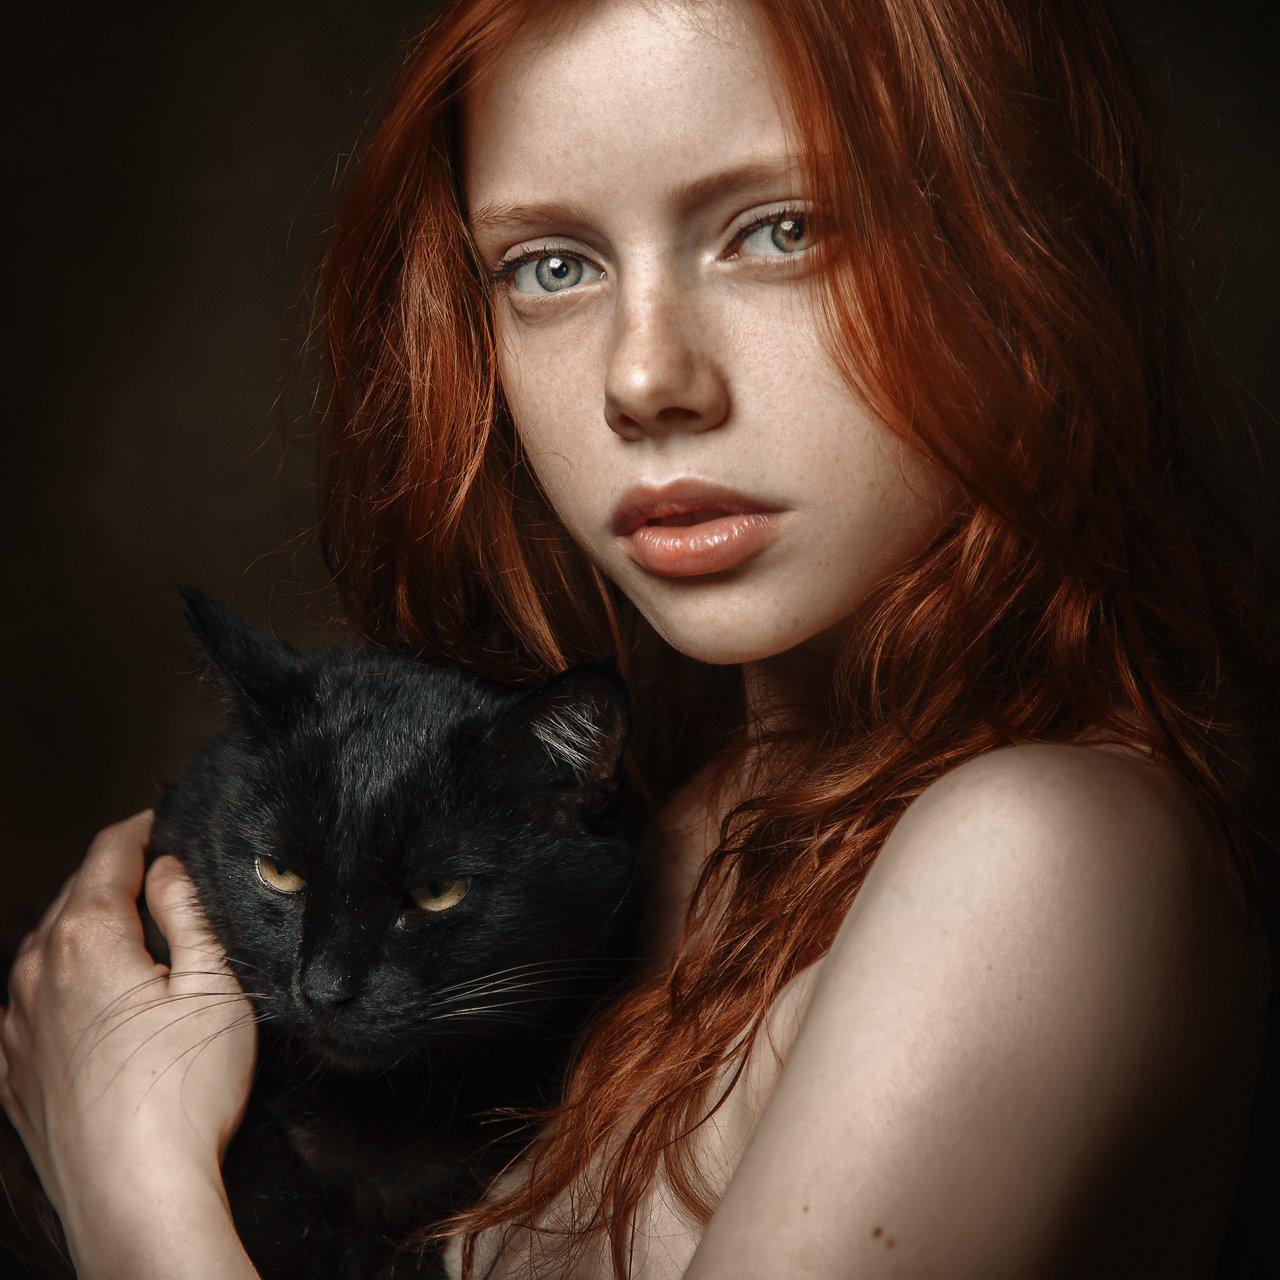 russian cat goddess pimpandhost Yükle (1024x1408)IMG Cat Goddess - Bing imagesCat Goddess by InfernoTornado  on DeviantArt.